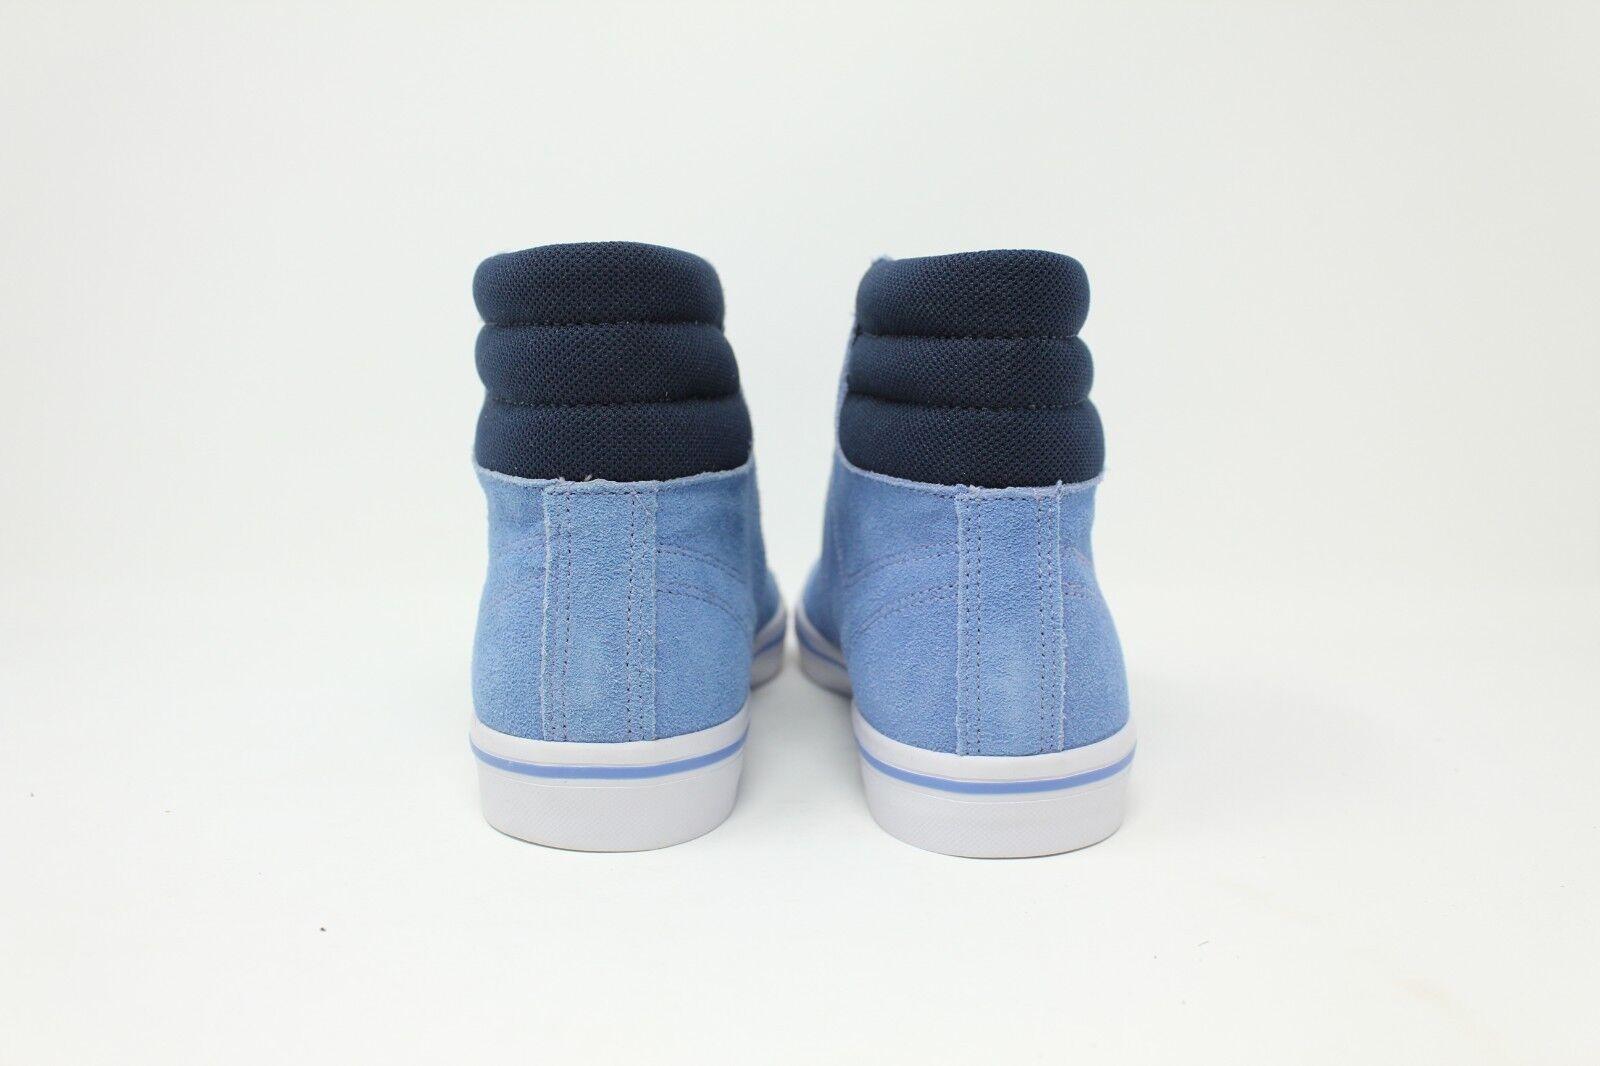 Lacoste Marcel Mid High # 7-26SPW1018BB1 Light Blau High Mid Top Sneaker Damens 6.5 - 8 7c1740